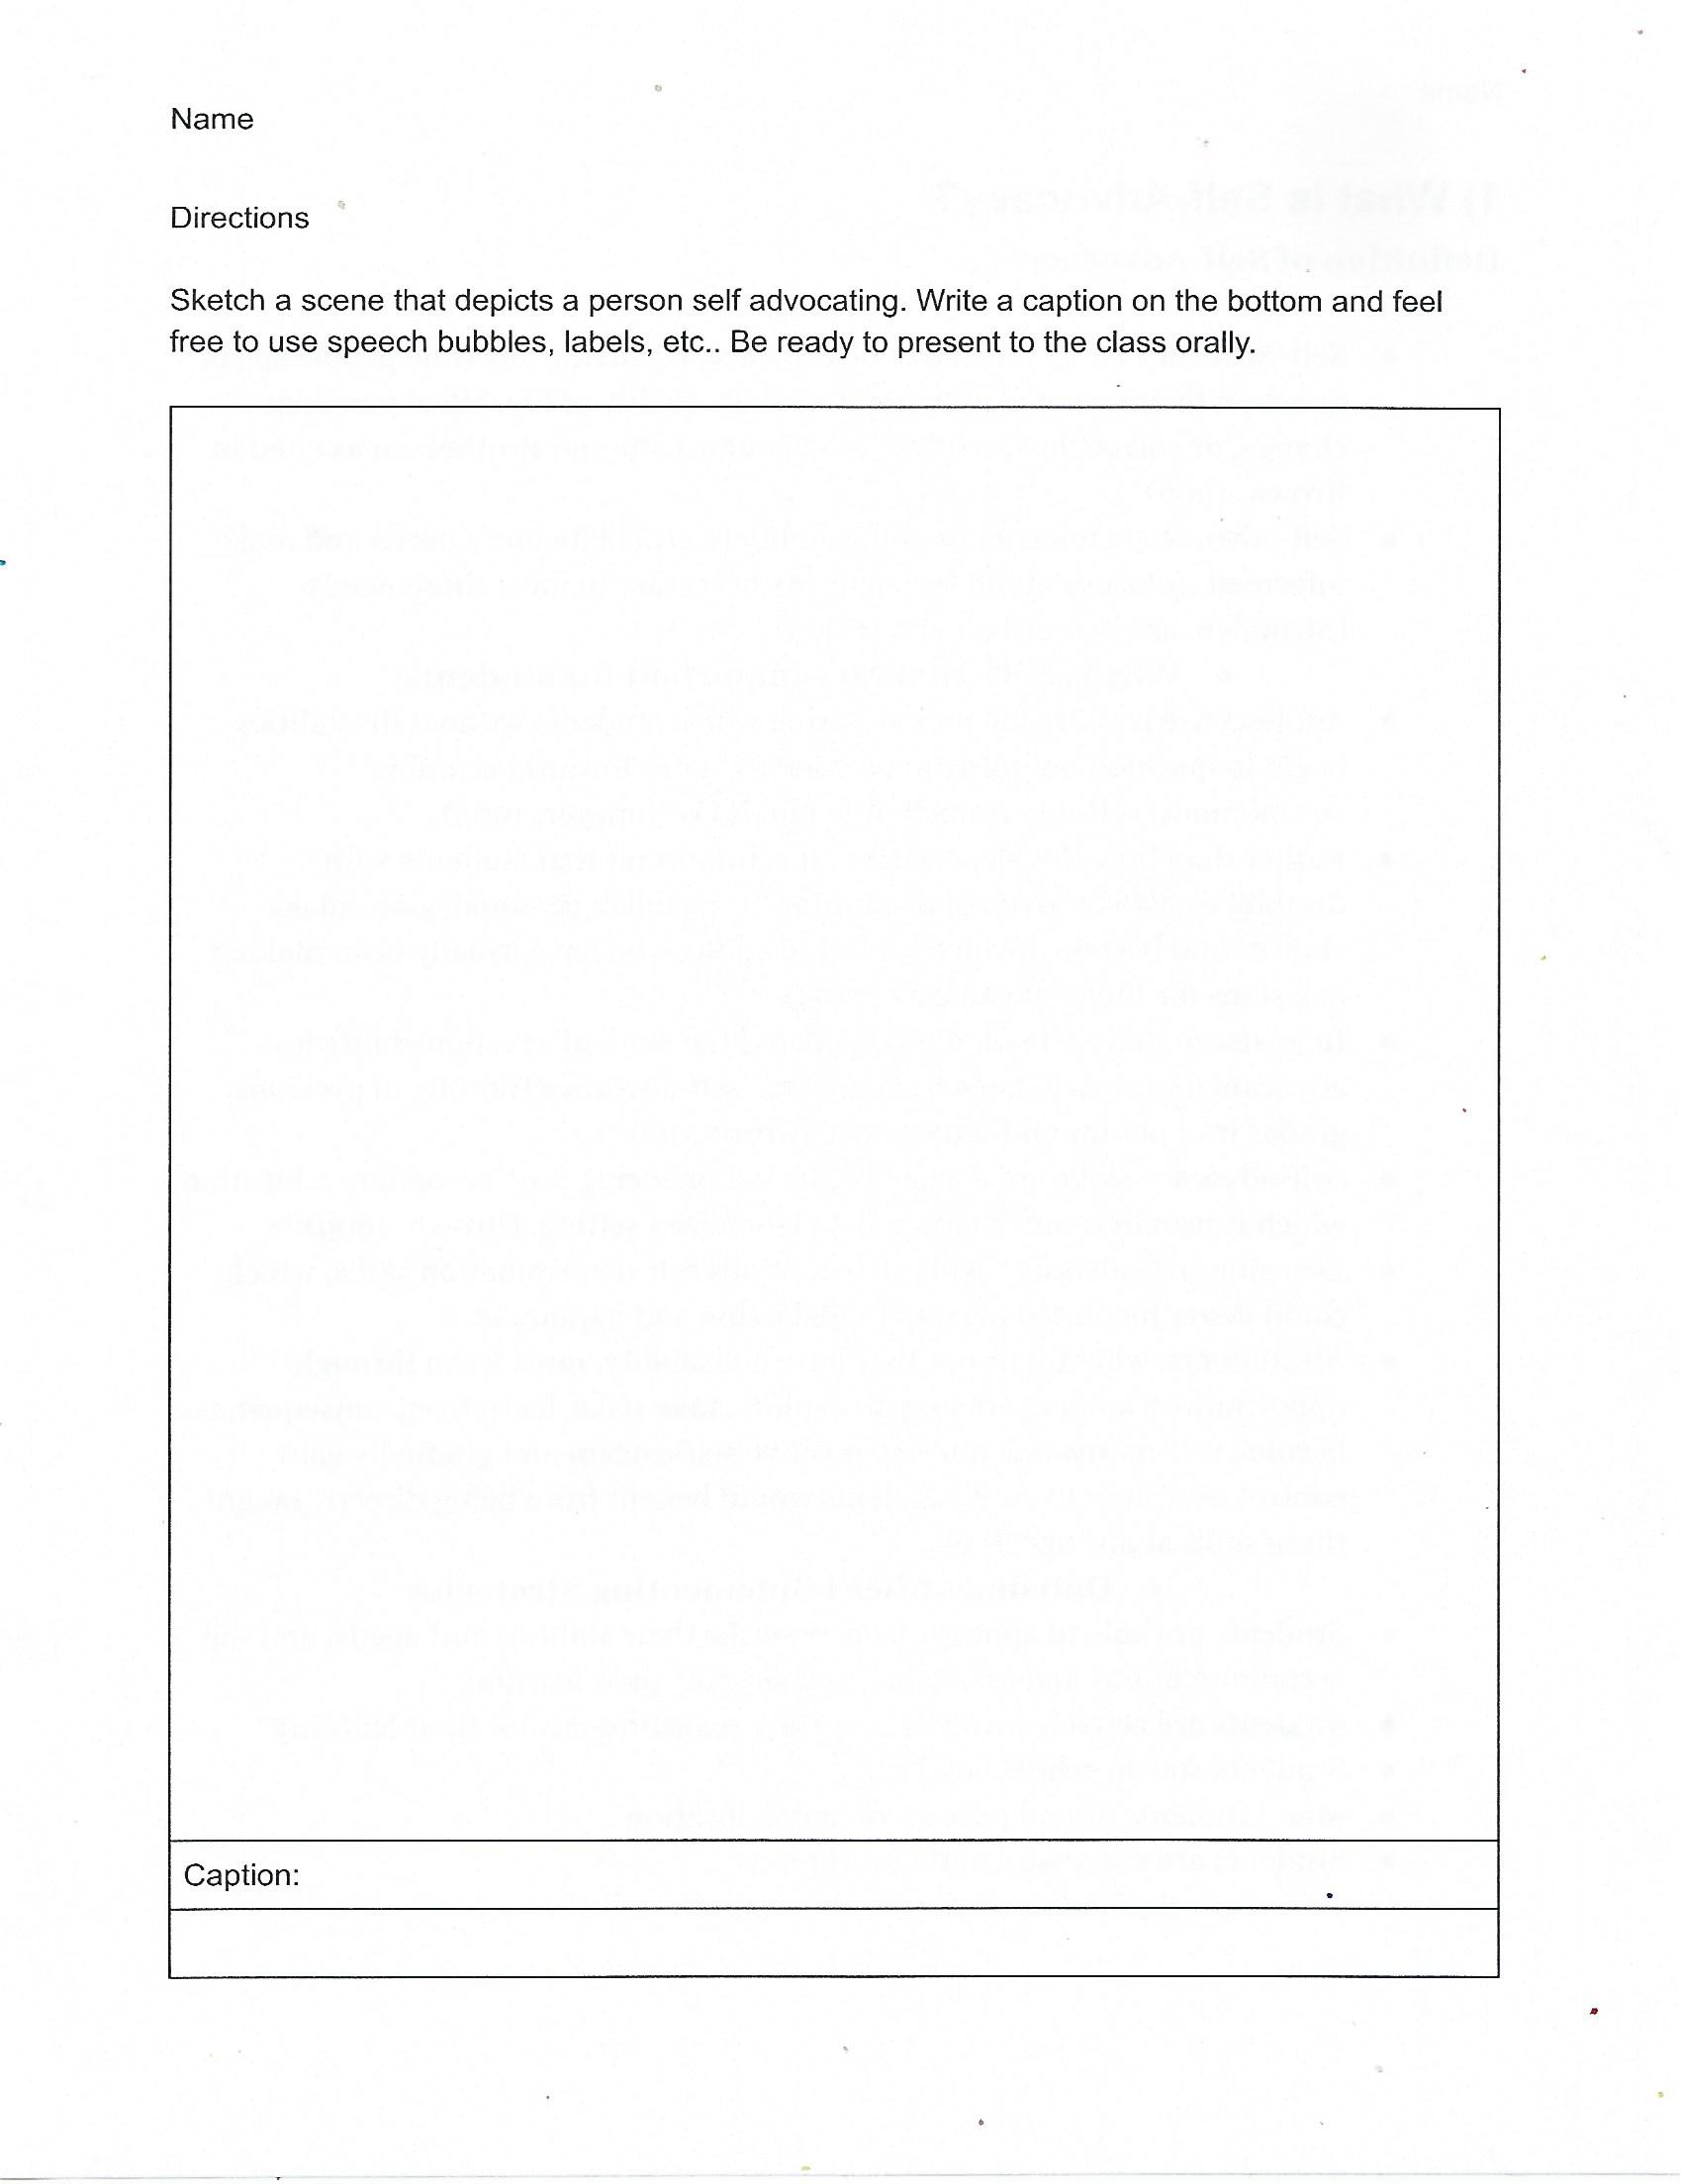 Self Advocacy Worksheet